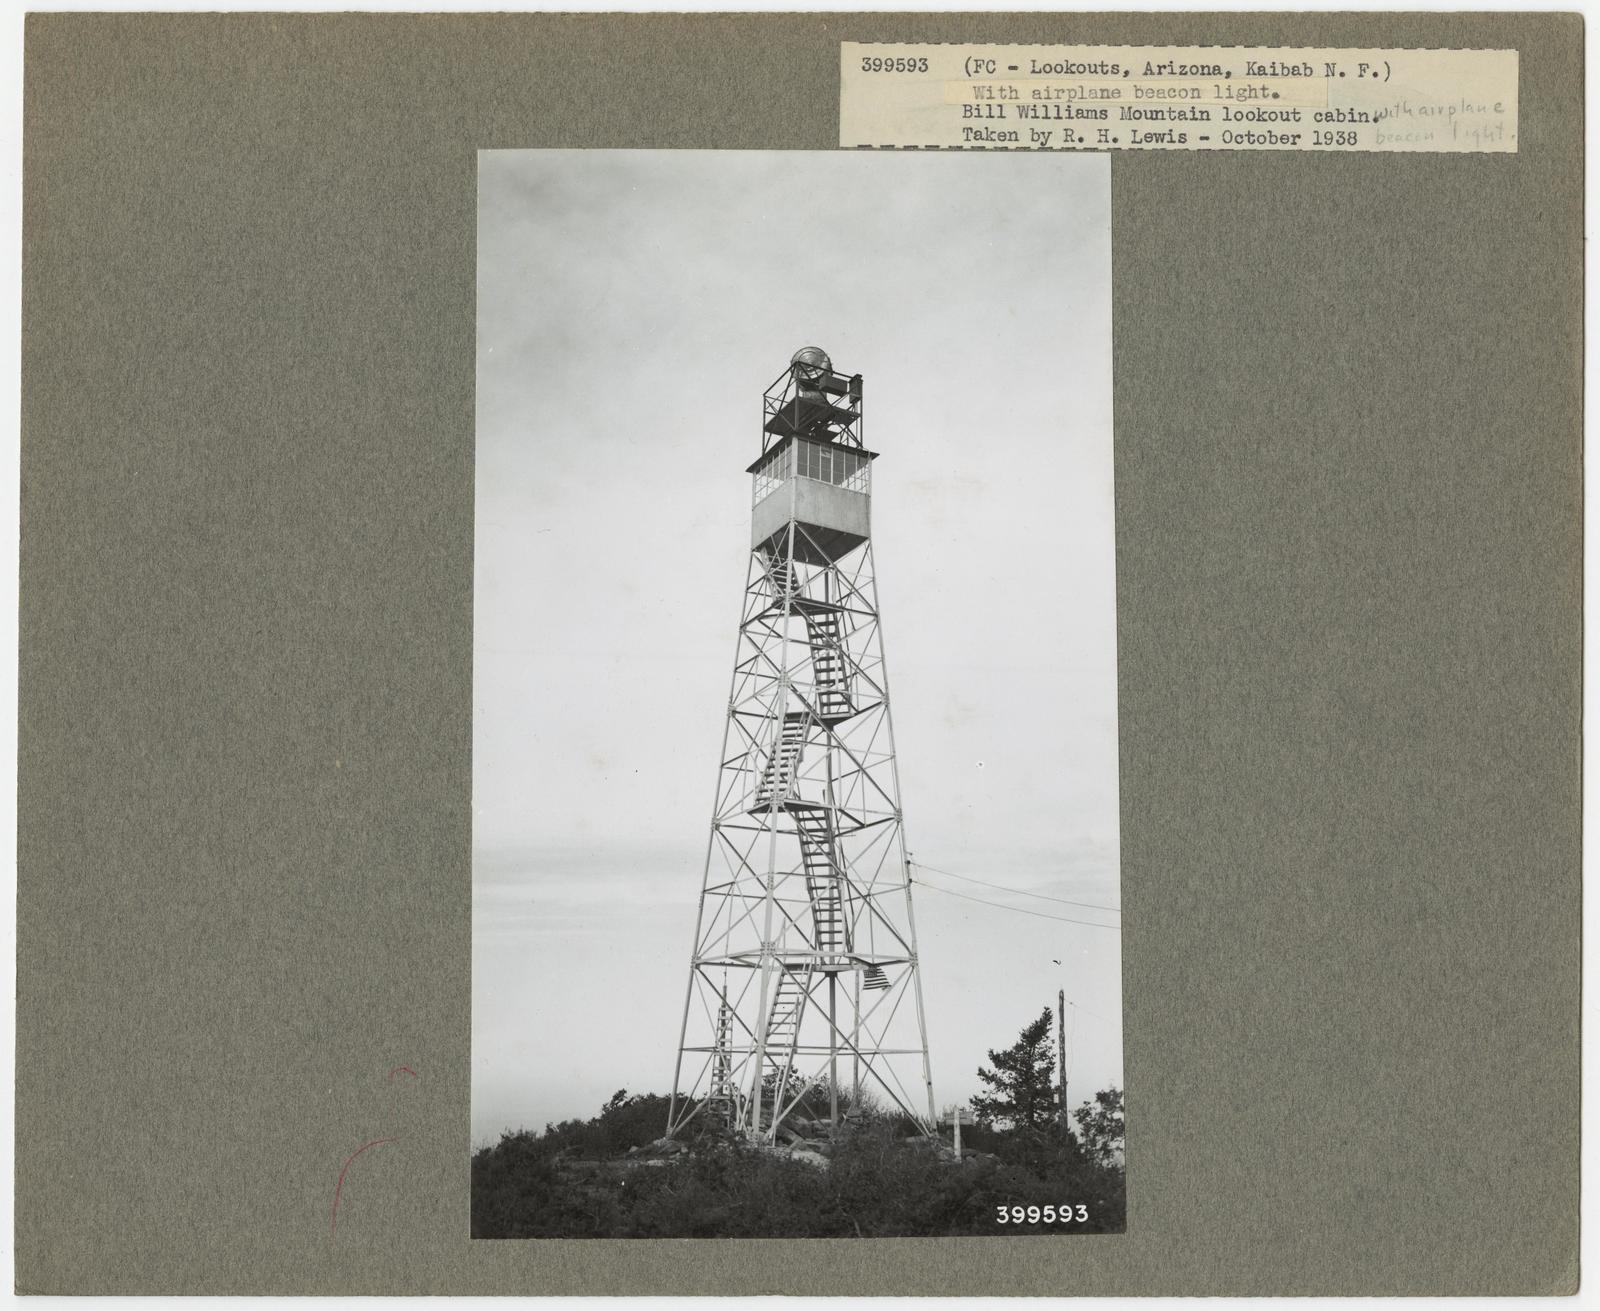 Fire Control: Lookouts - Arizona